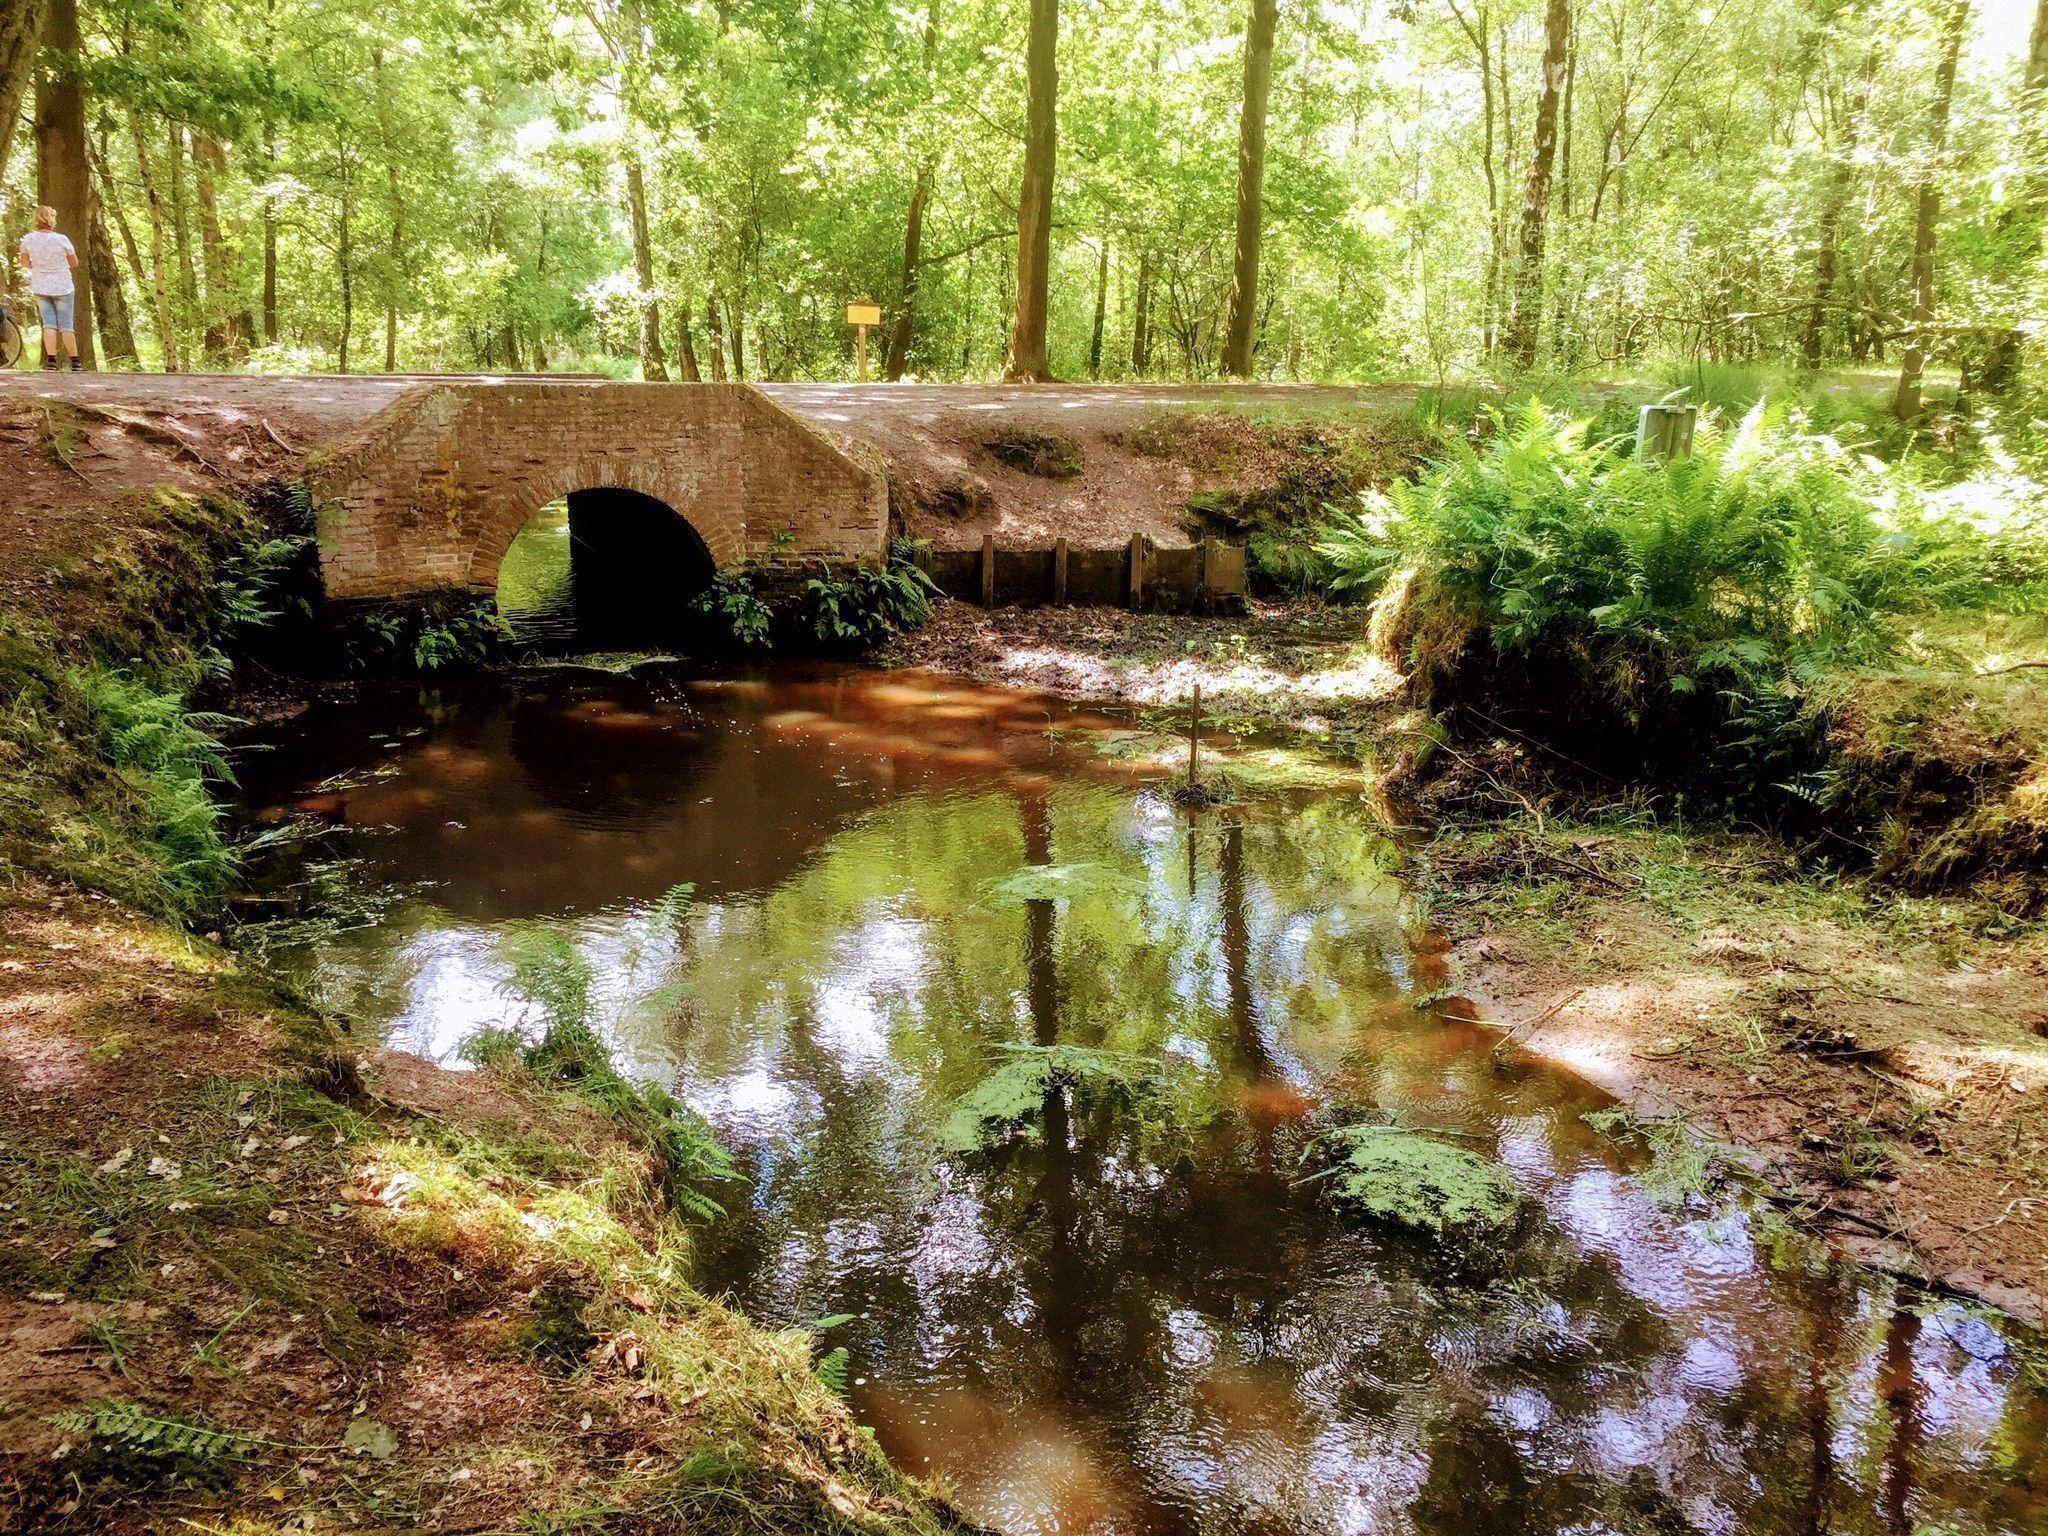 wandelen, wandelroutes, social distancing, nederland